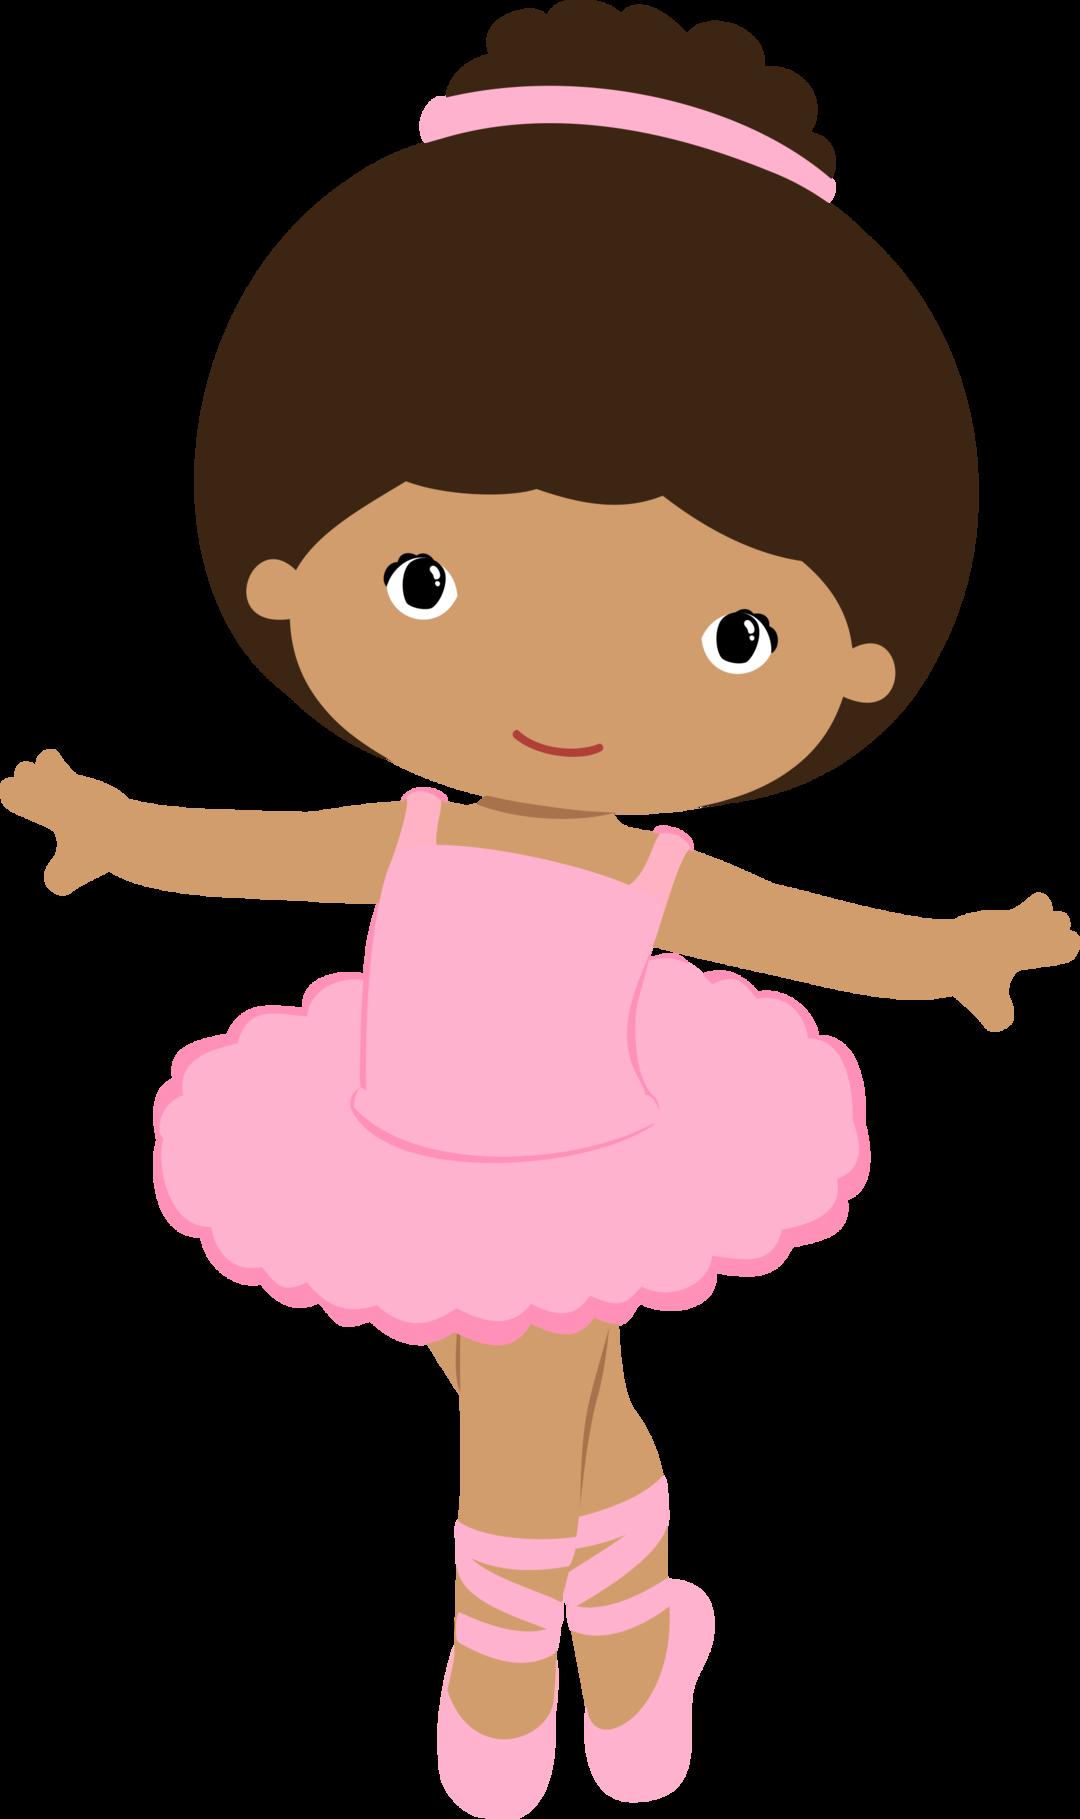 Simple Ballerina Drawing